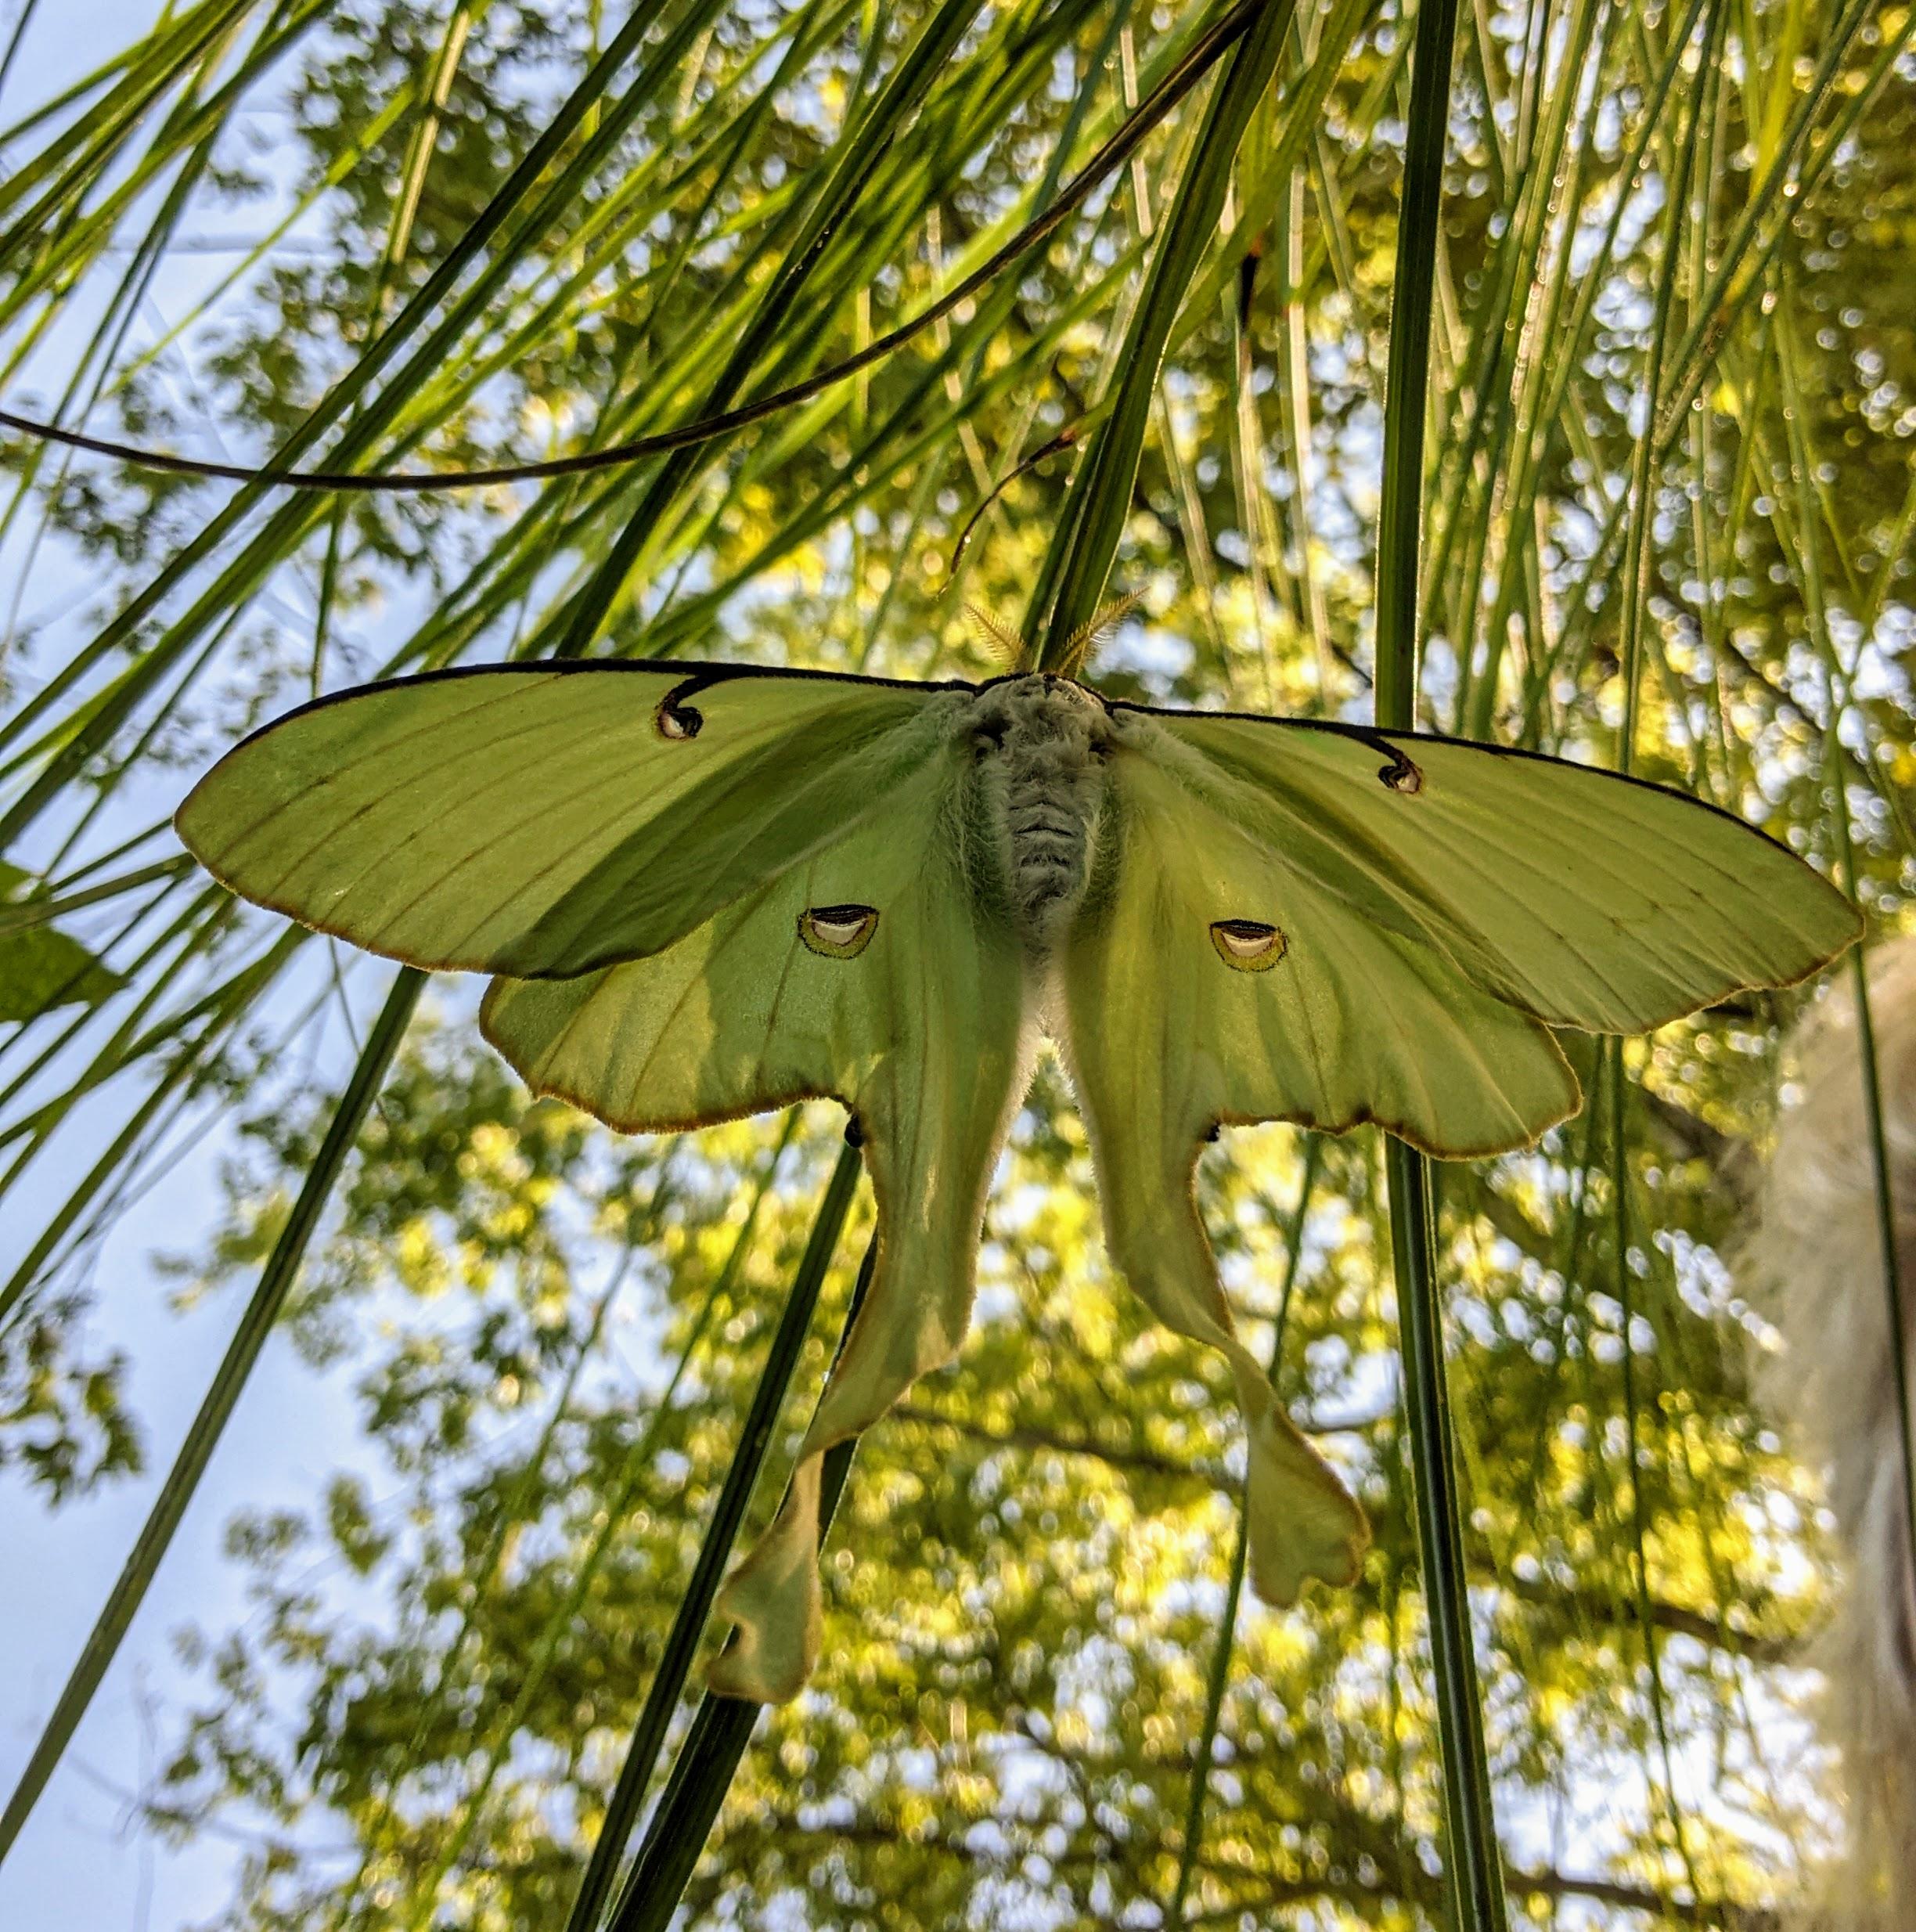 Pregnant luna moth on miscanthus grass